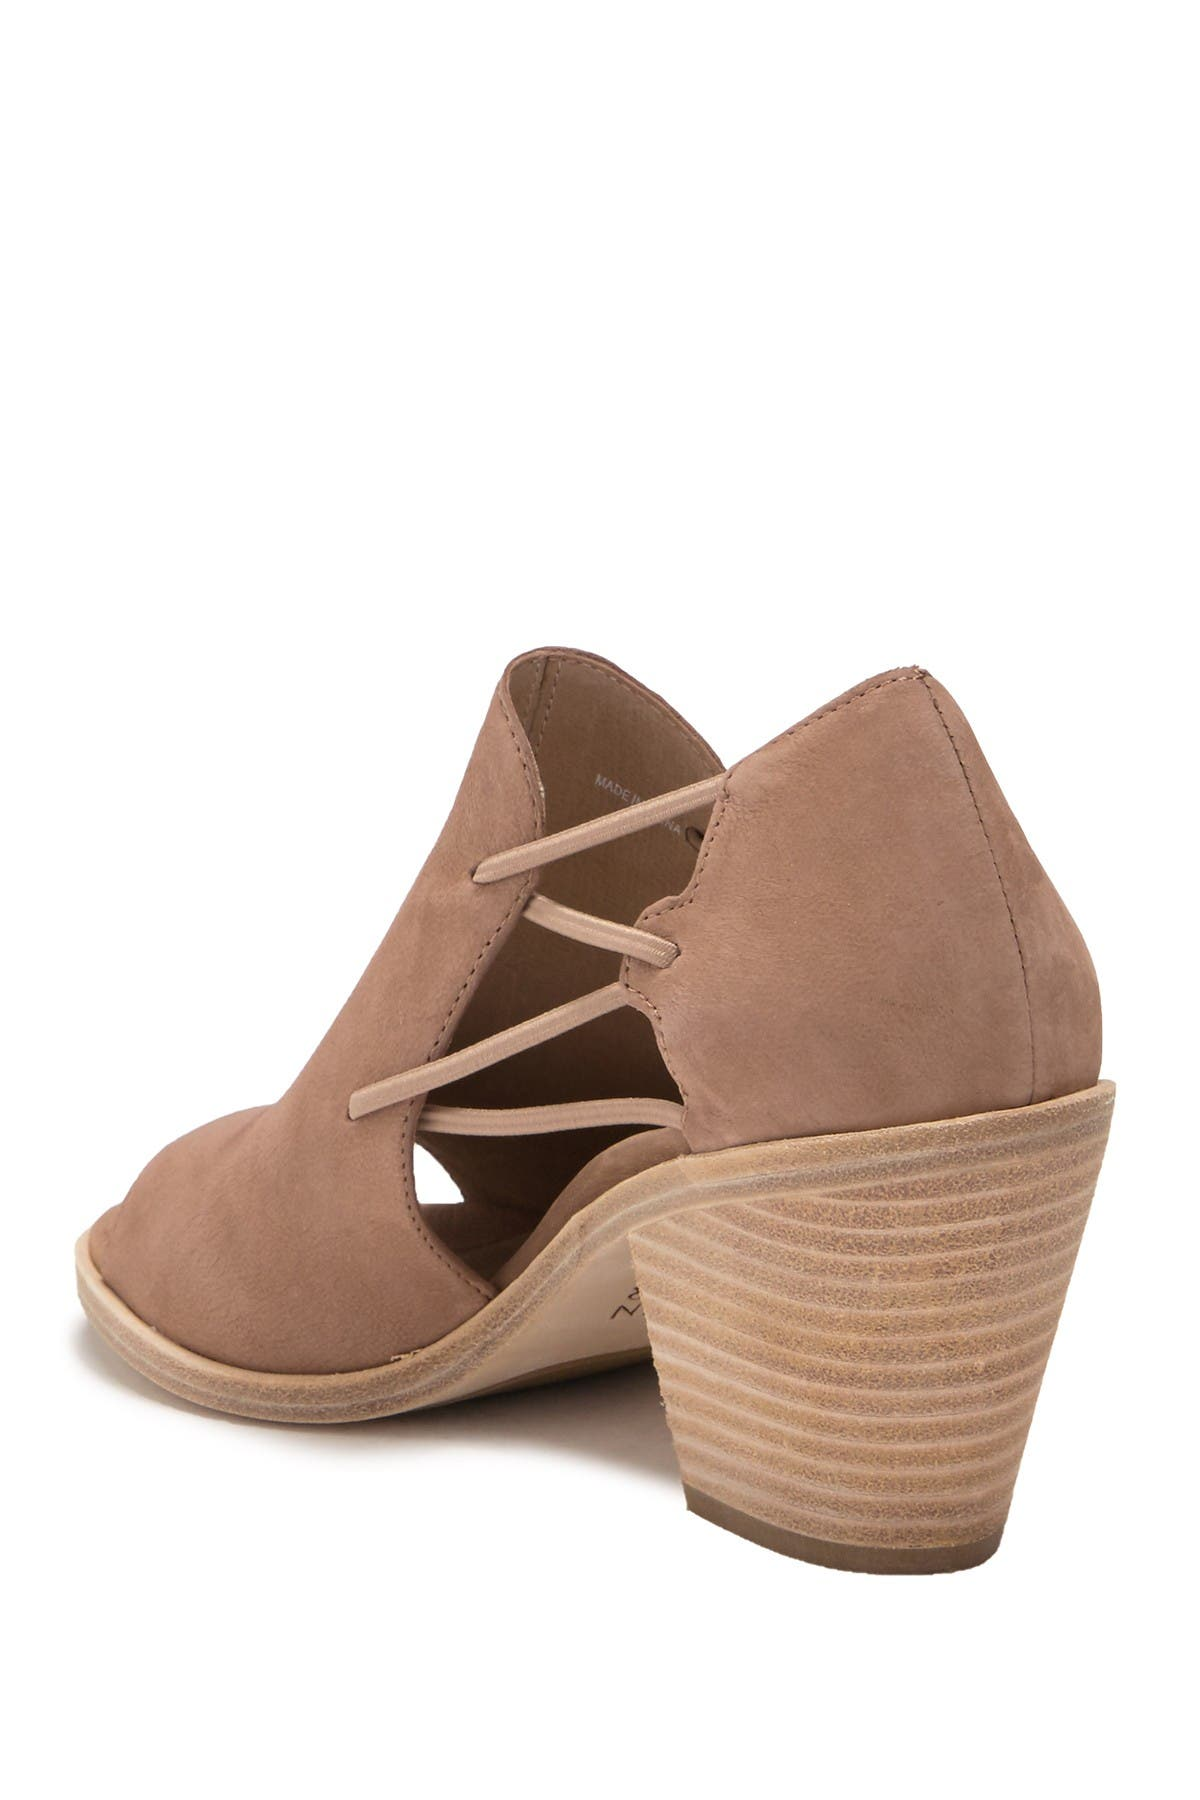 Nikki Peep Toe Block Heel Sandal